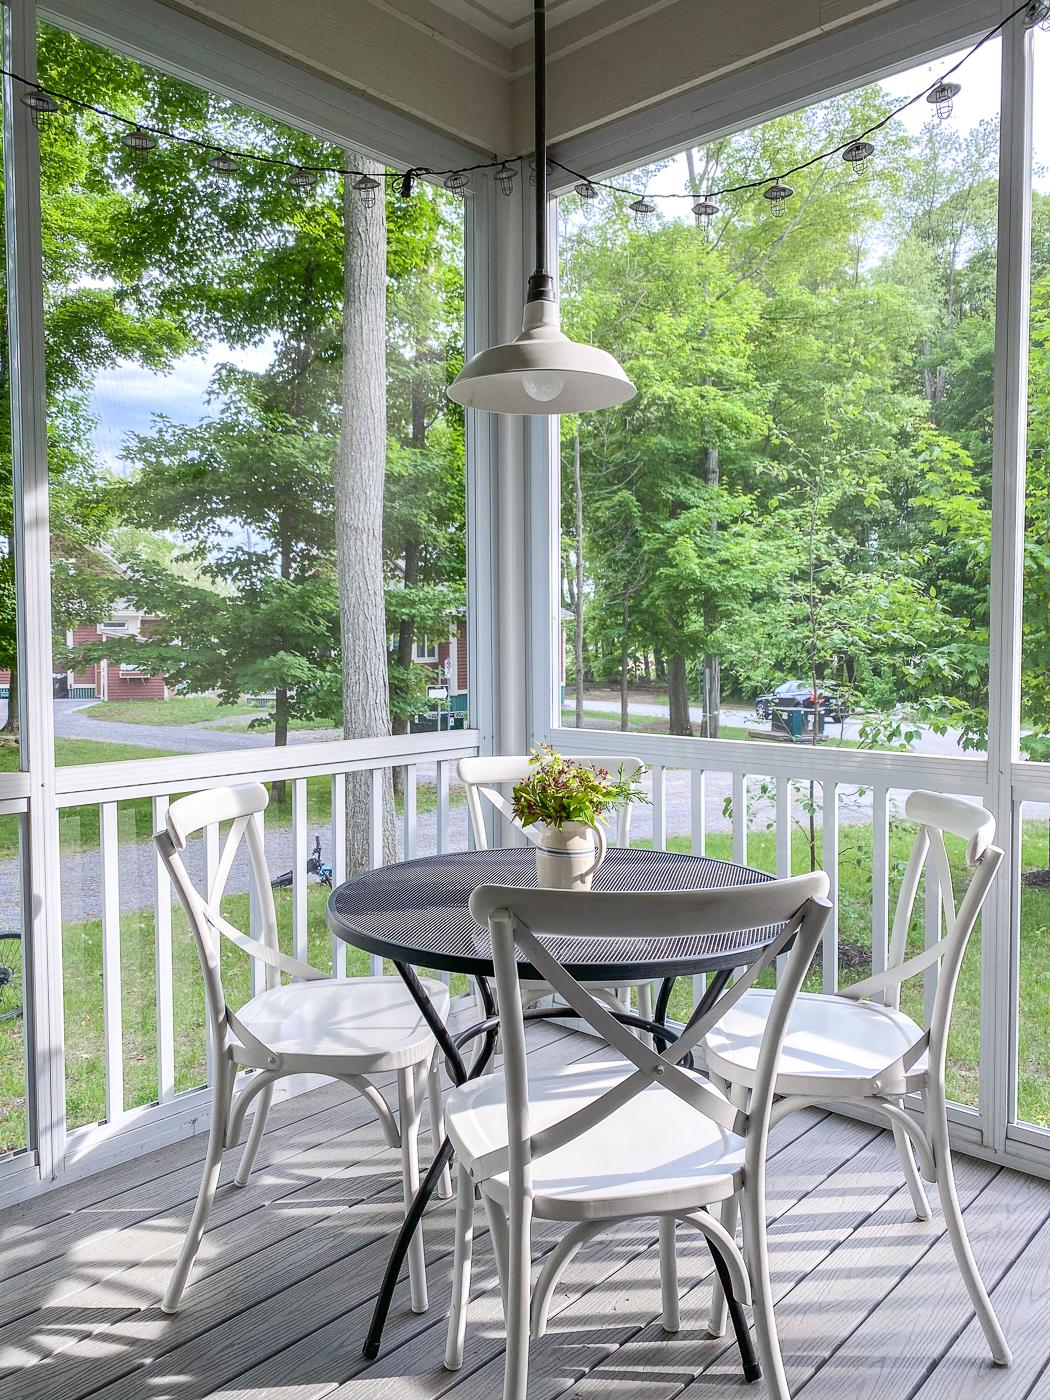 summer cottage decorating ideas, summer cottage decor, cottage porch decor, covered porch furniture